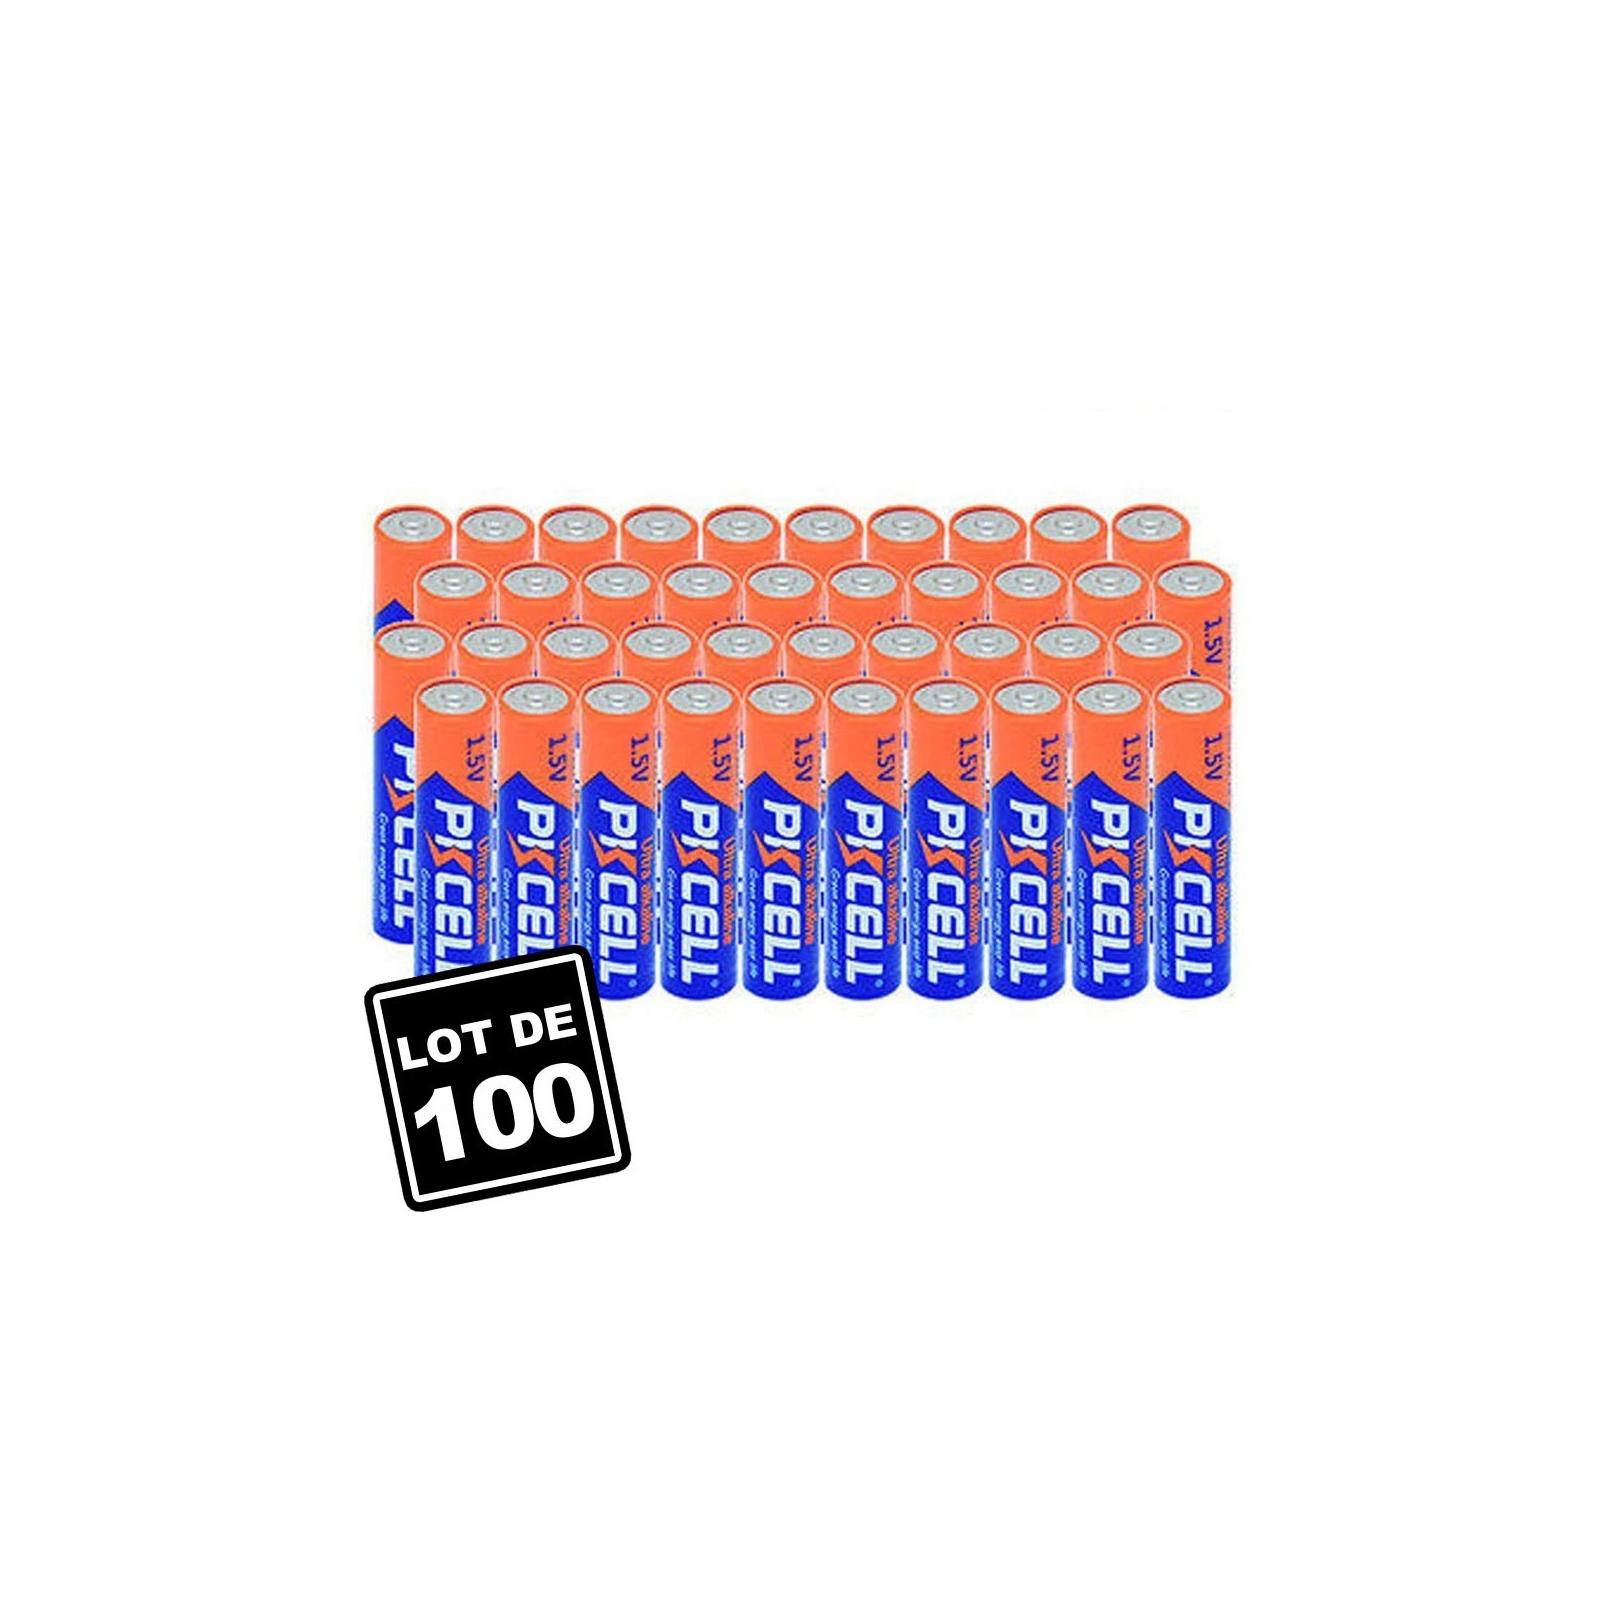 Lot de 100 Piles AAA LR03 Ultra Alcaline PKCell 1.5V